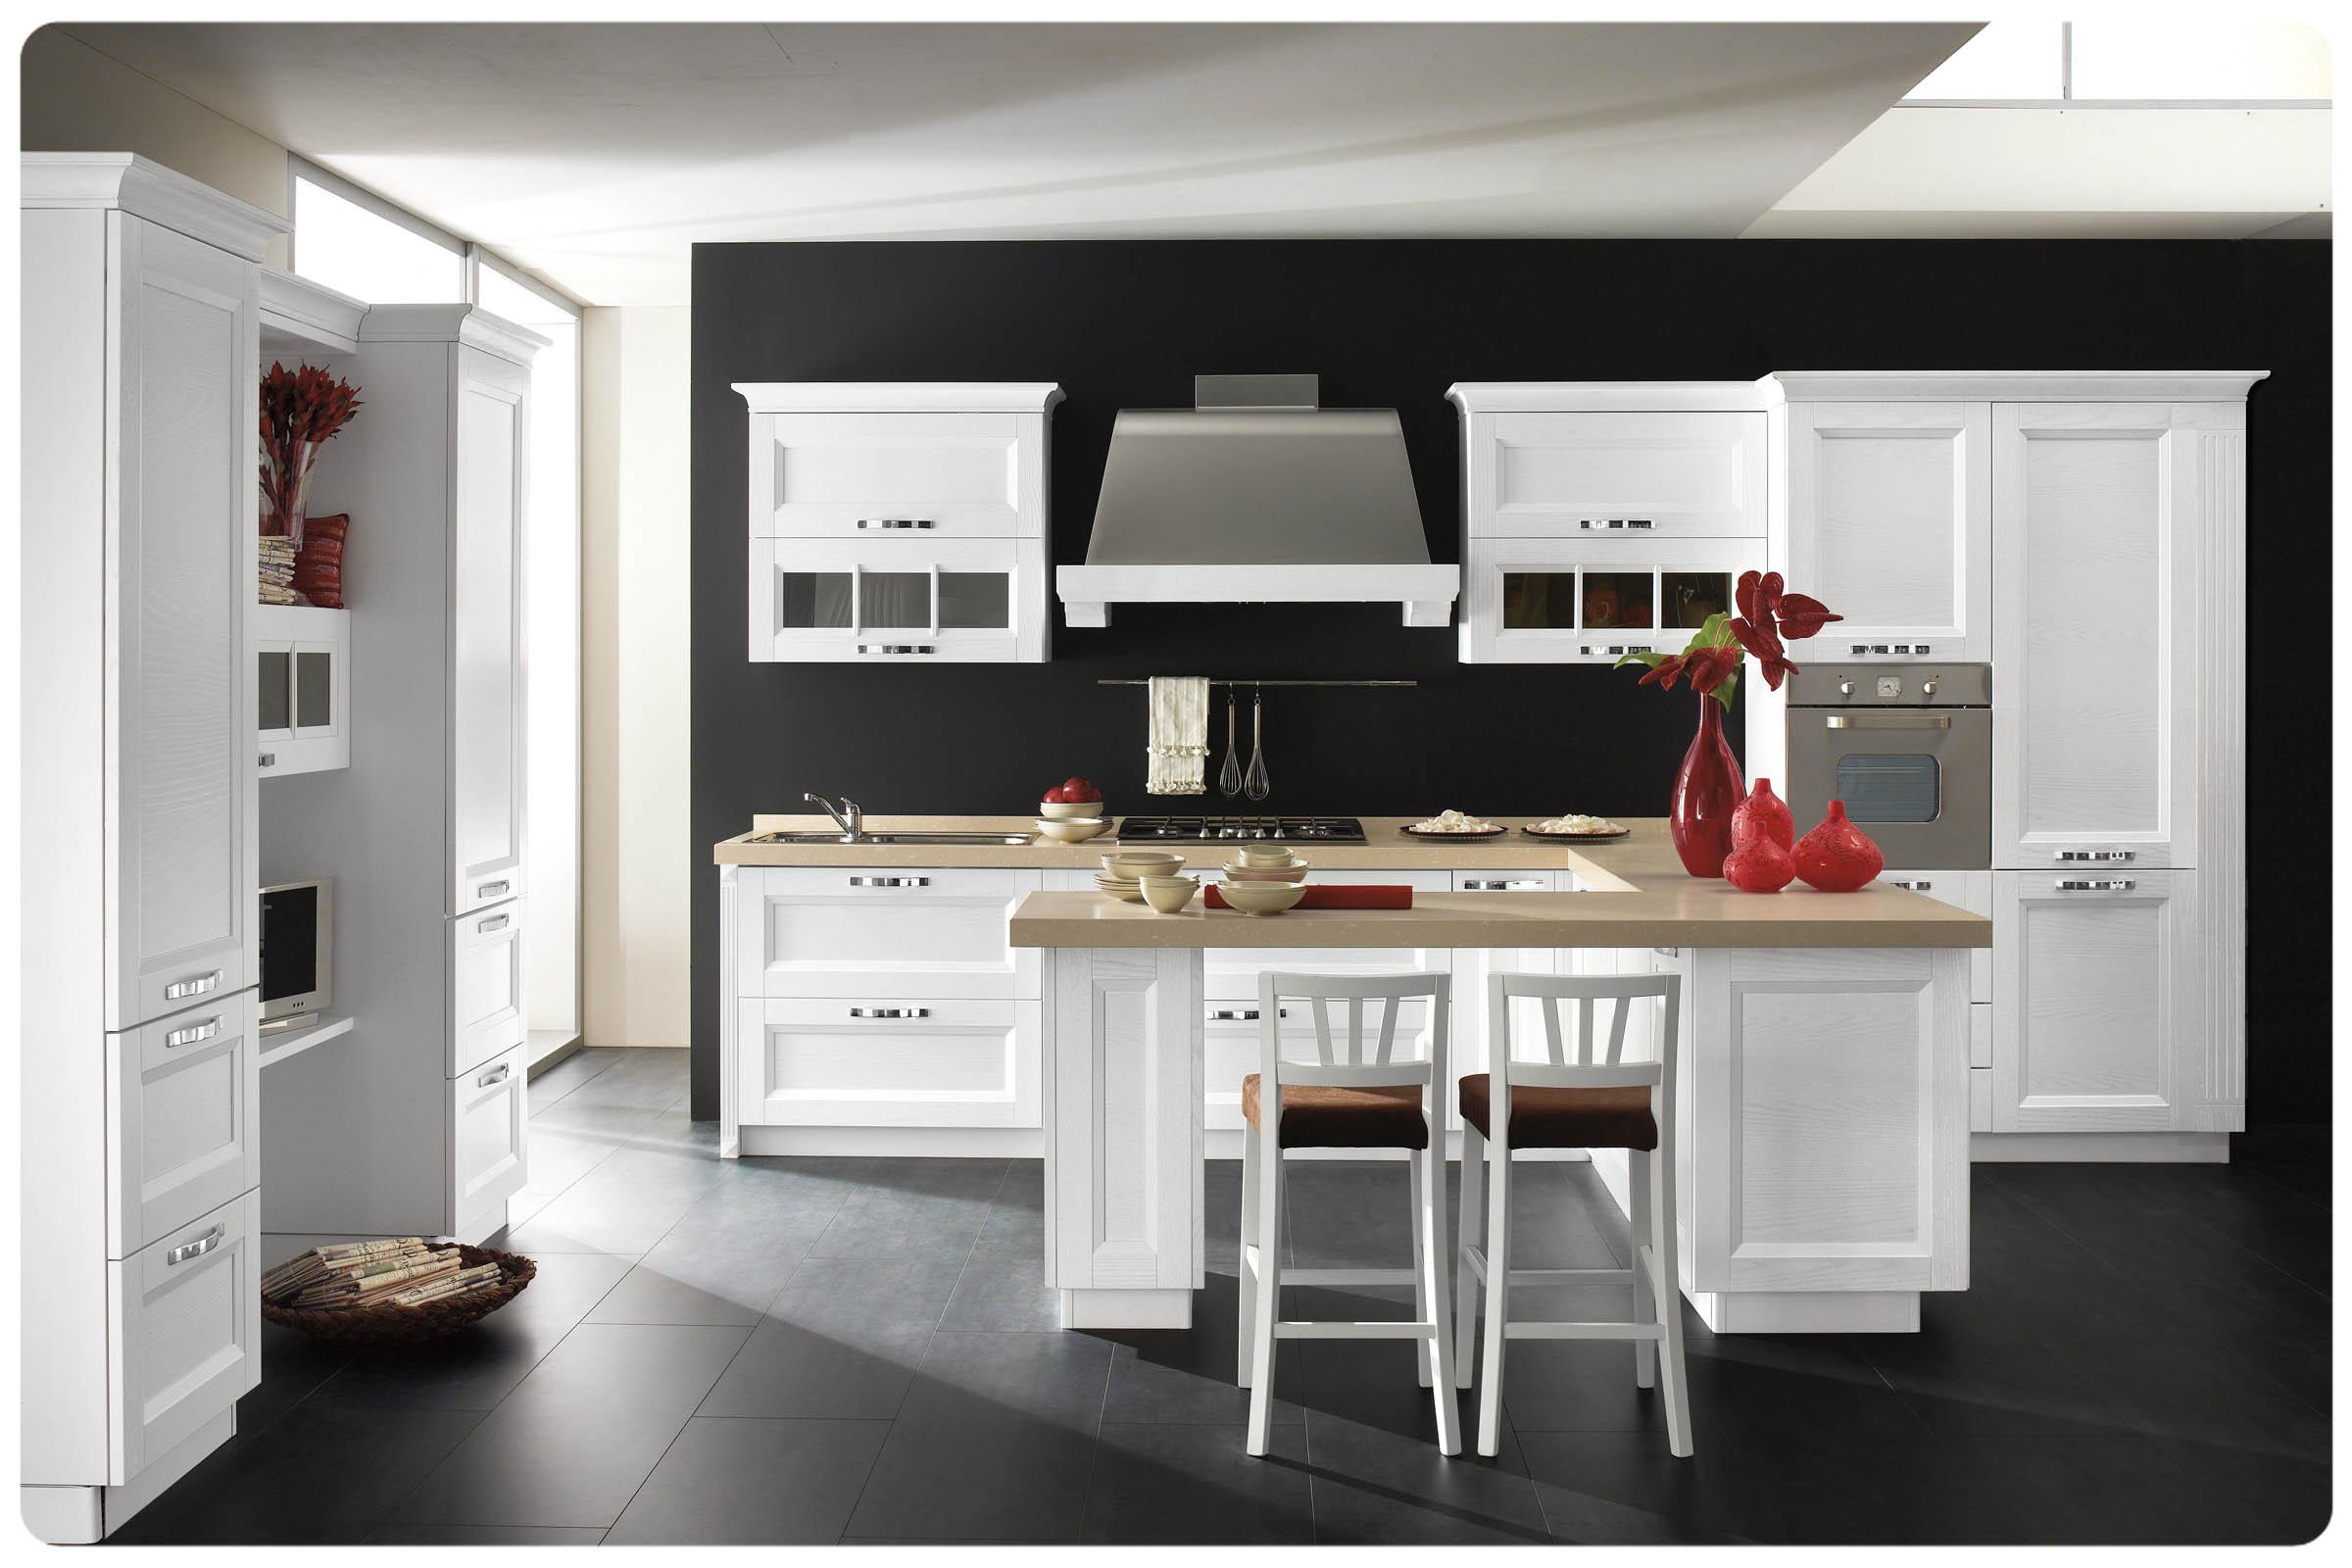 Beautiful stosa cucina beverly pictures ideas design - Cucina beverly stosa prezzi ...